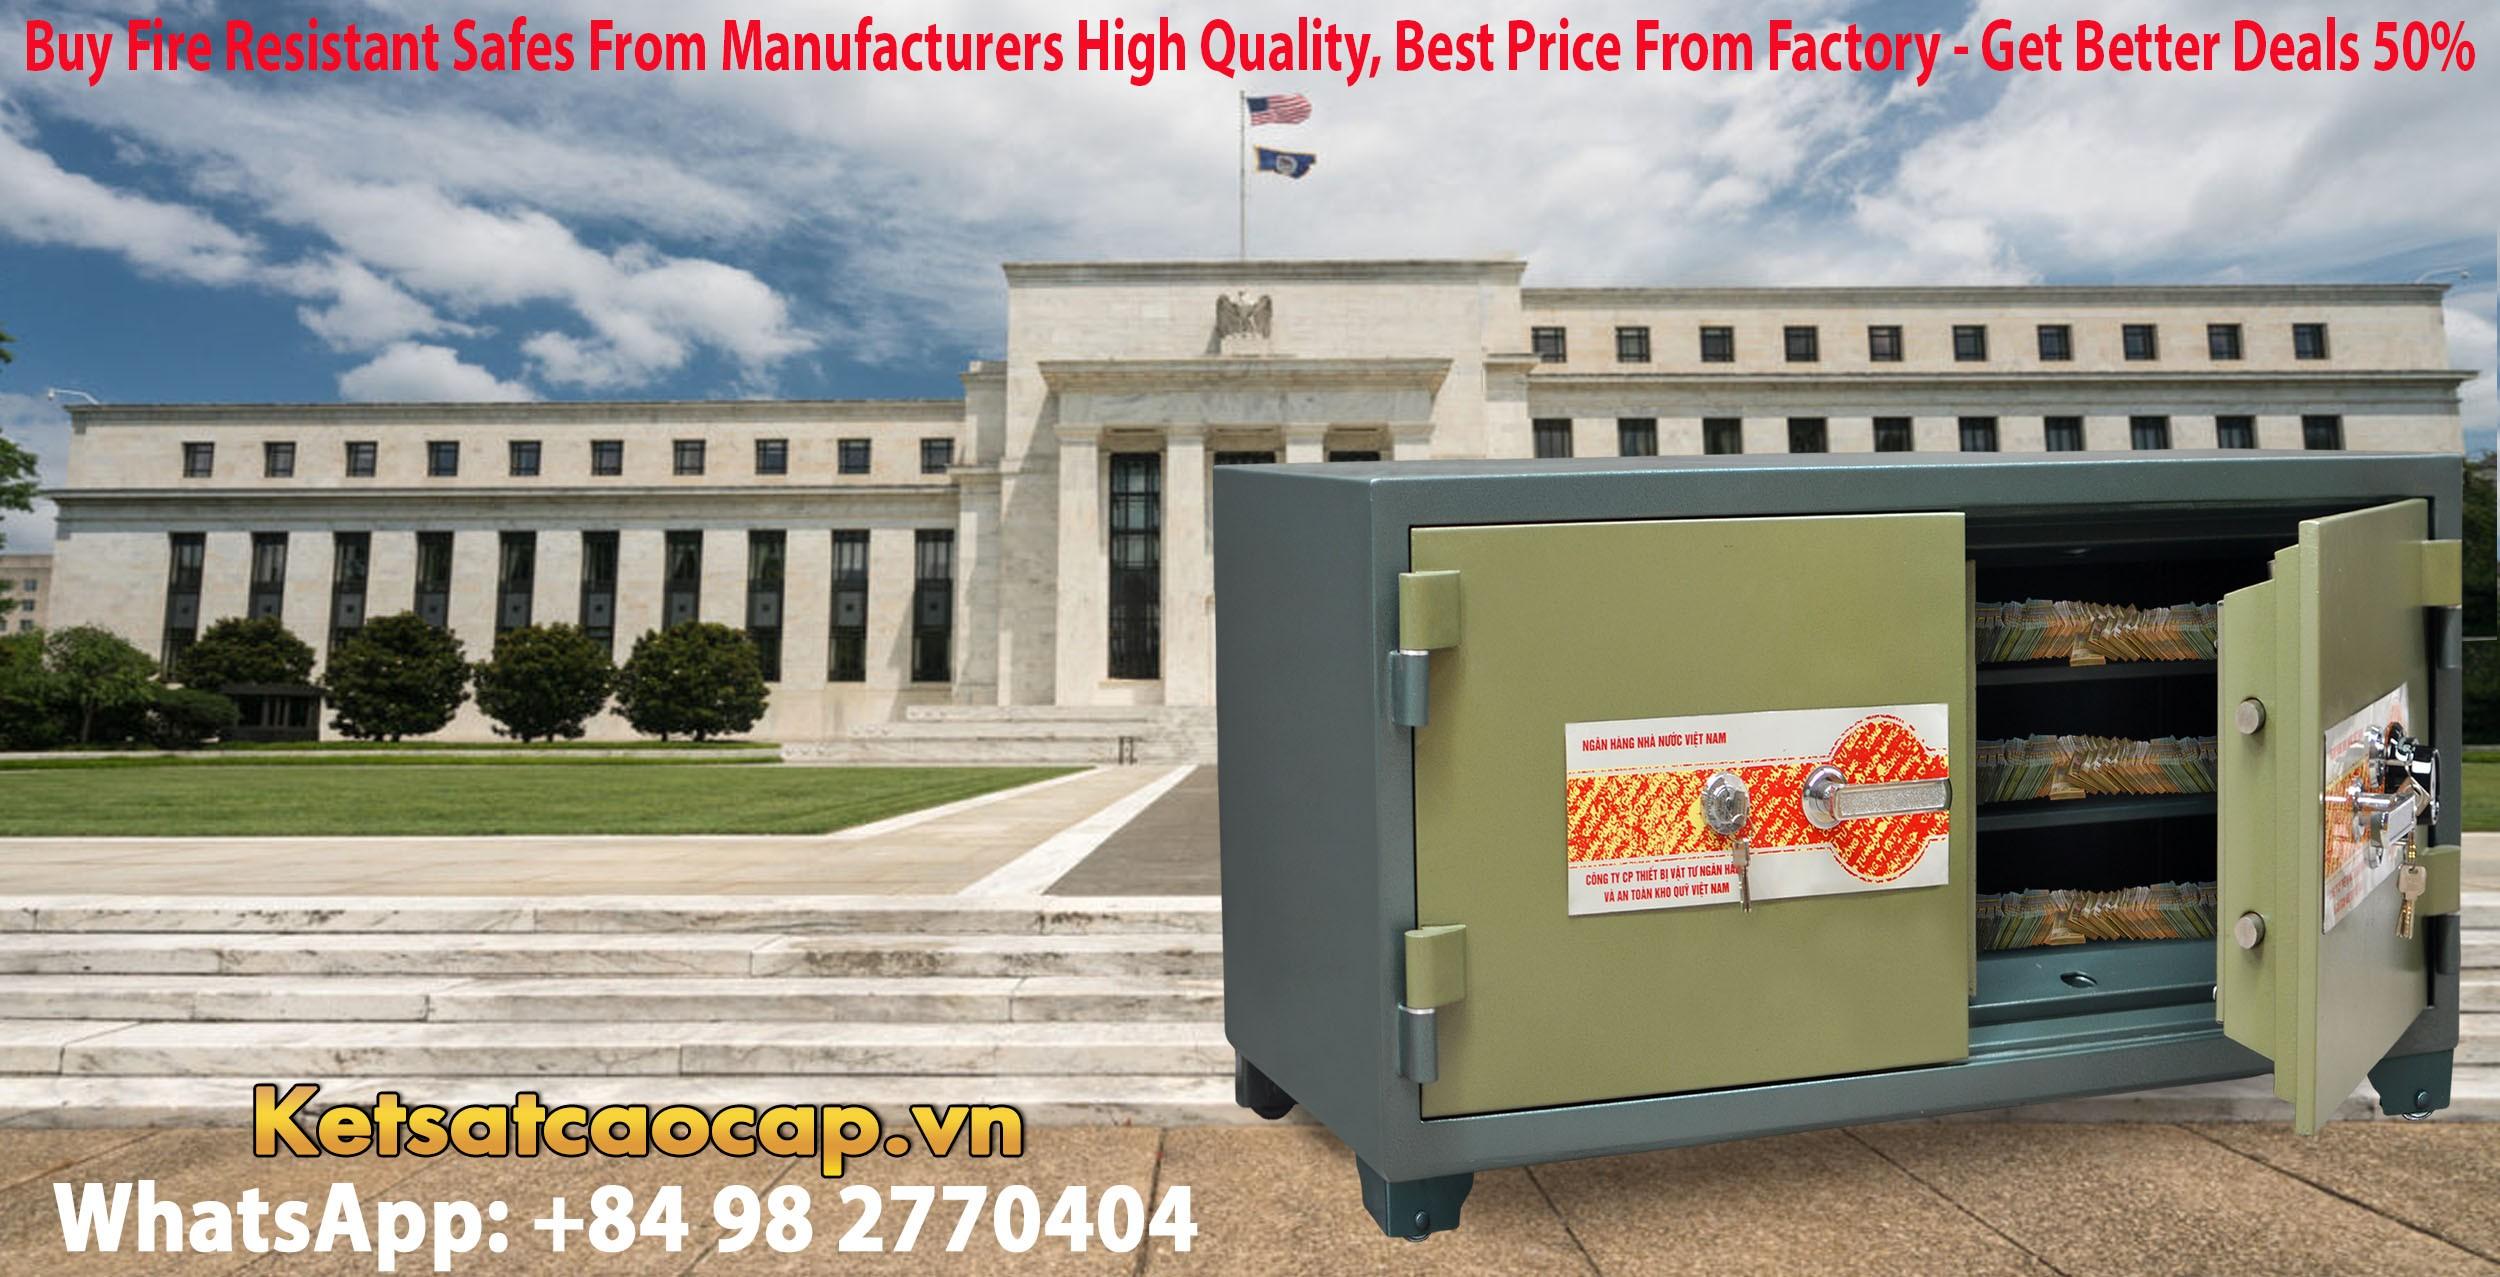 Bank Safes & Vaults